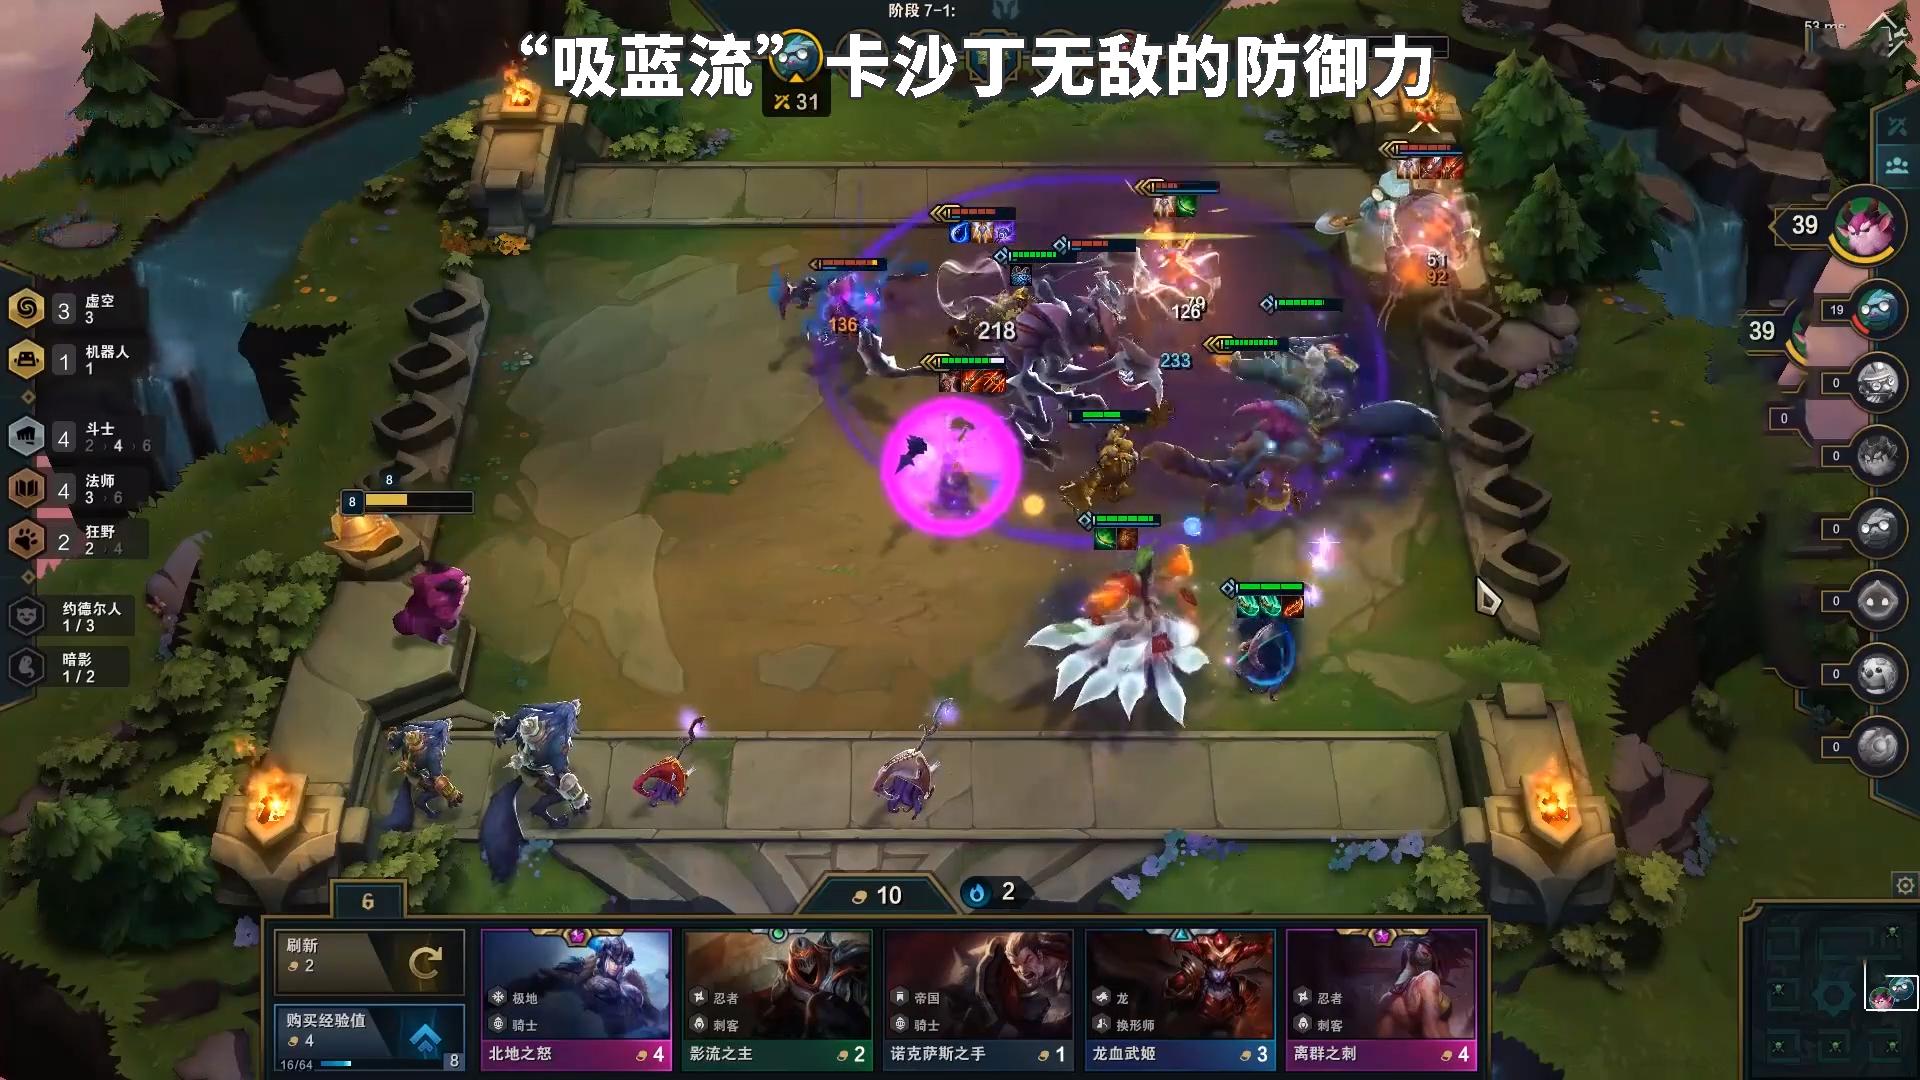 LOL云顶之弈新版本出现 异化 ,阵容过度复杂,玩家 选择困难